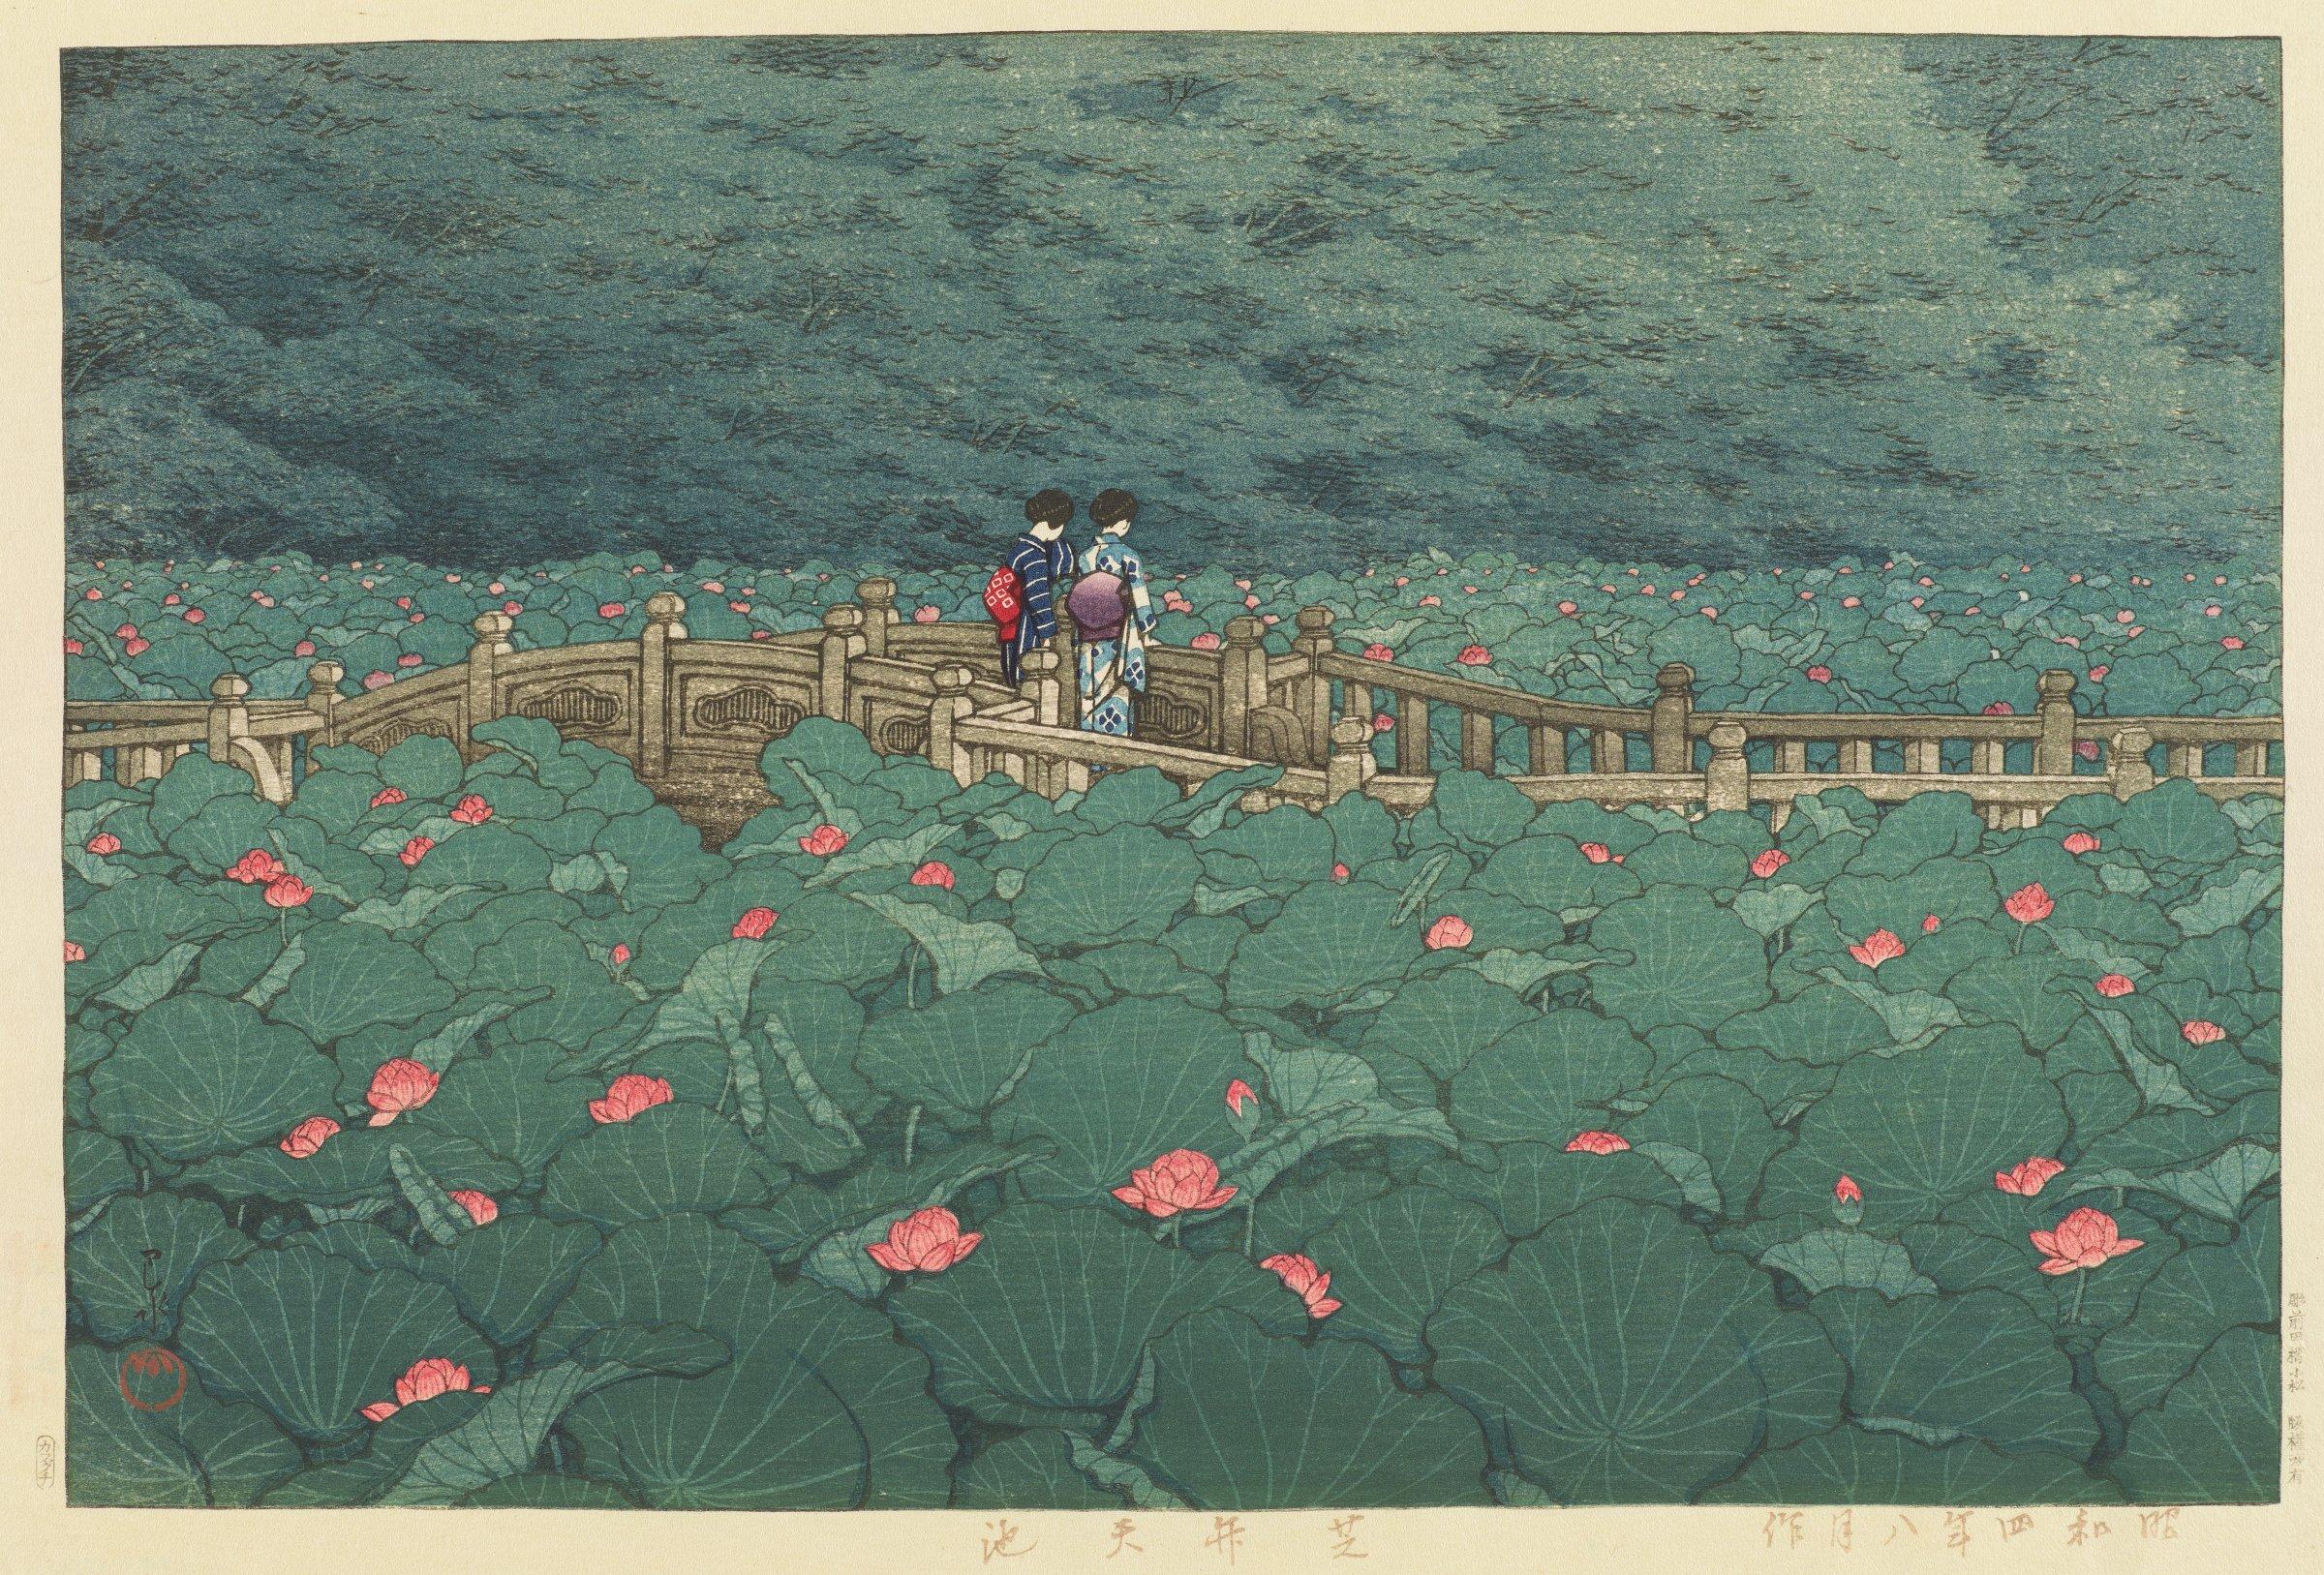 Benten Pond, Shiba (Benten Ike), Kawase Hasui, ink and color on paper